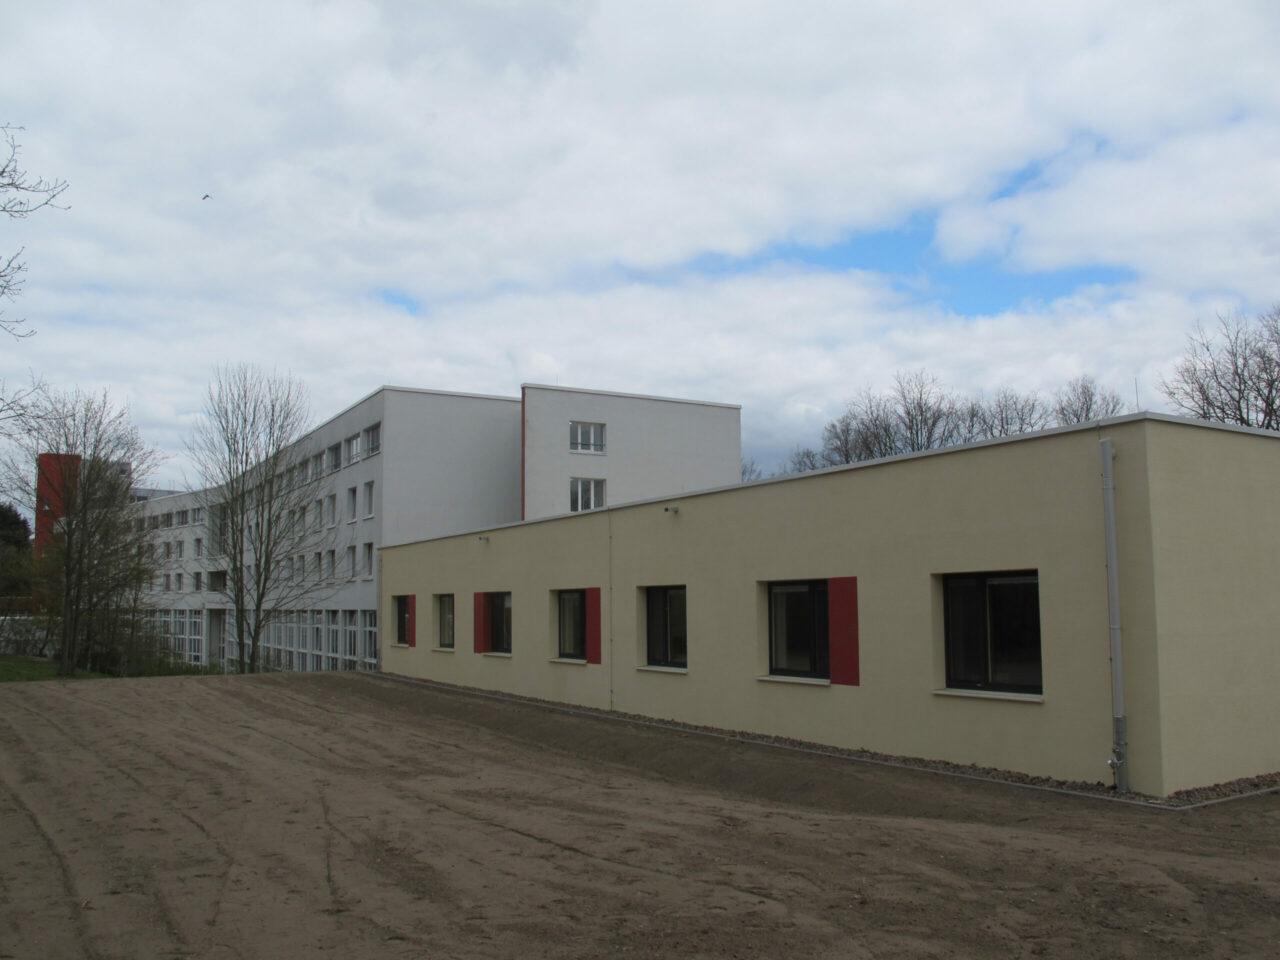 Badbodentein construction préfabriquée